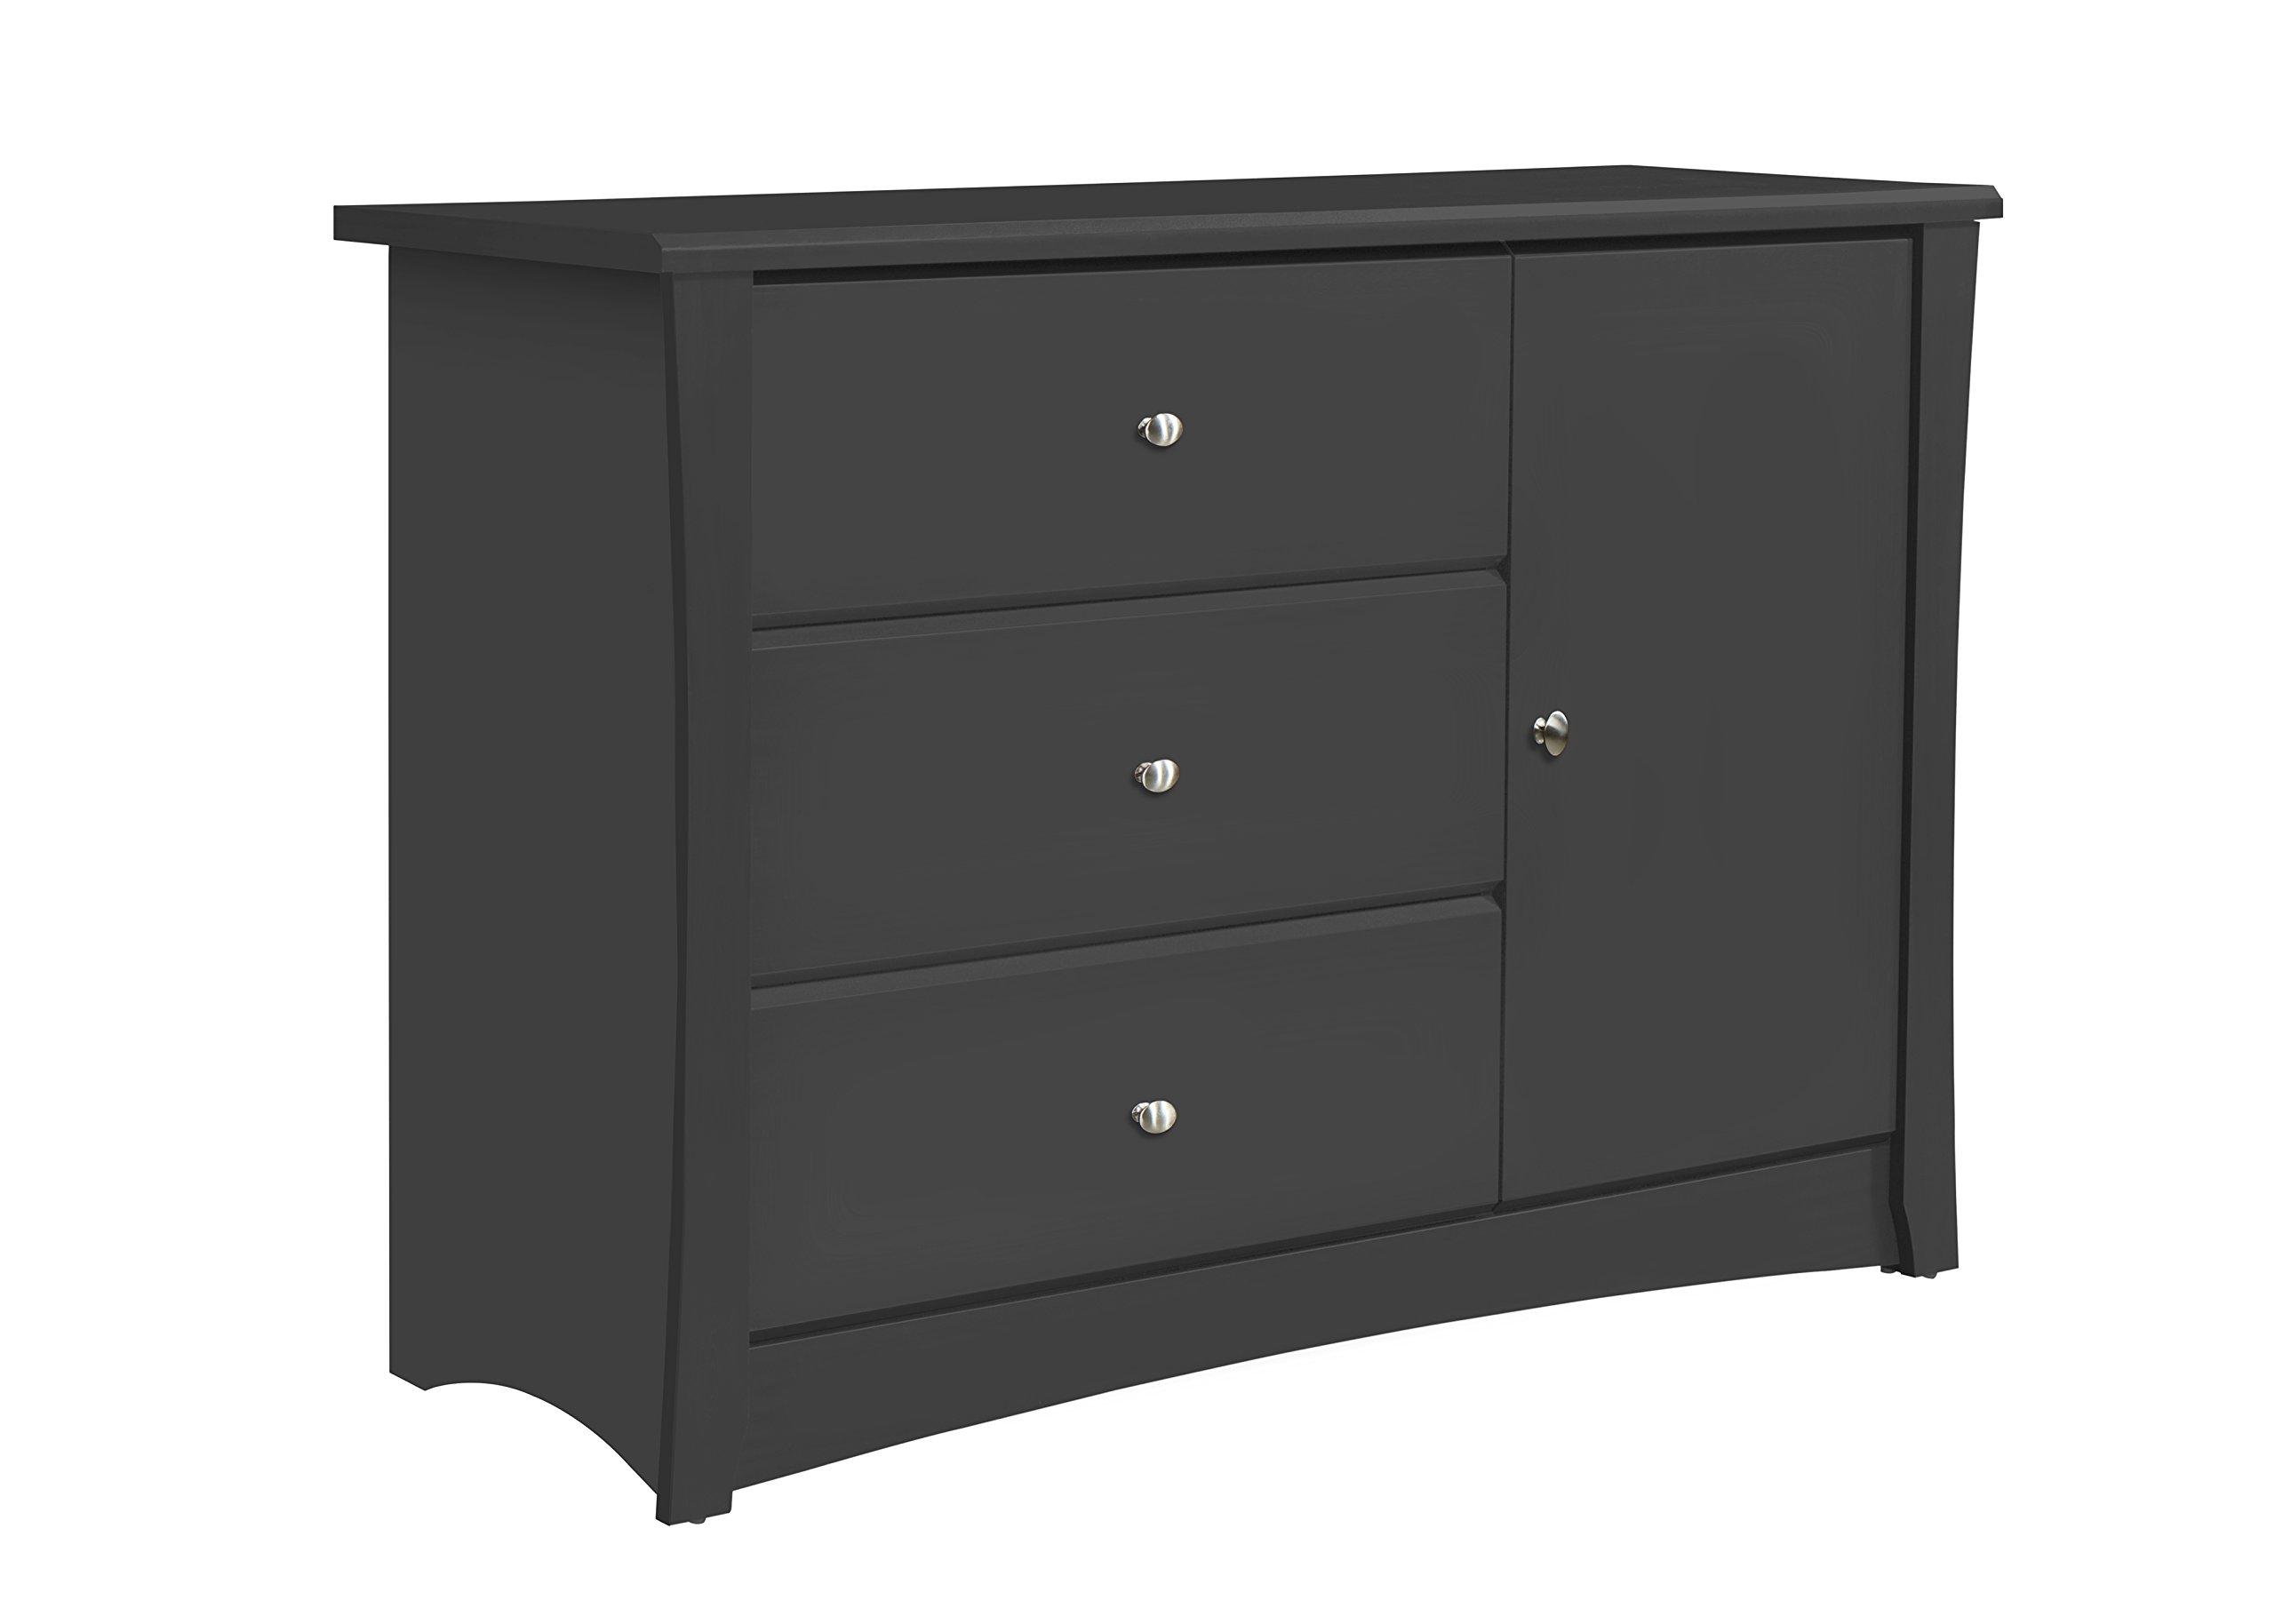 Storkcraft Crescent 3 Drawer Combo Dresser, Gray